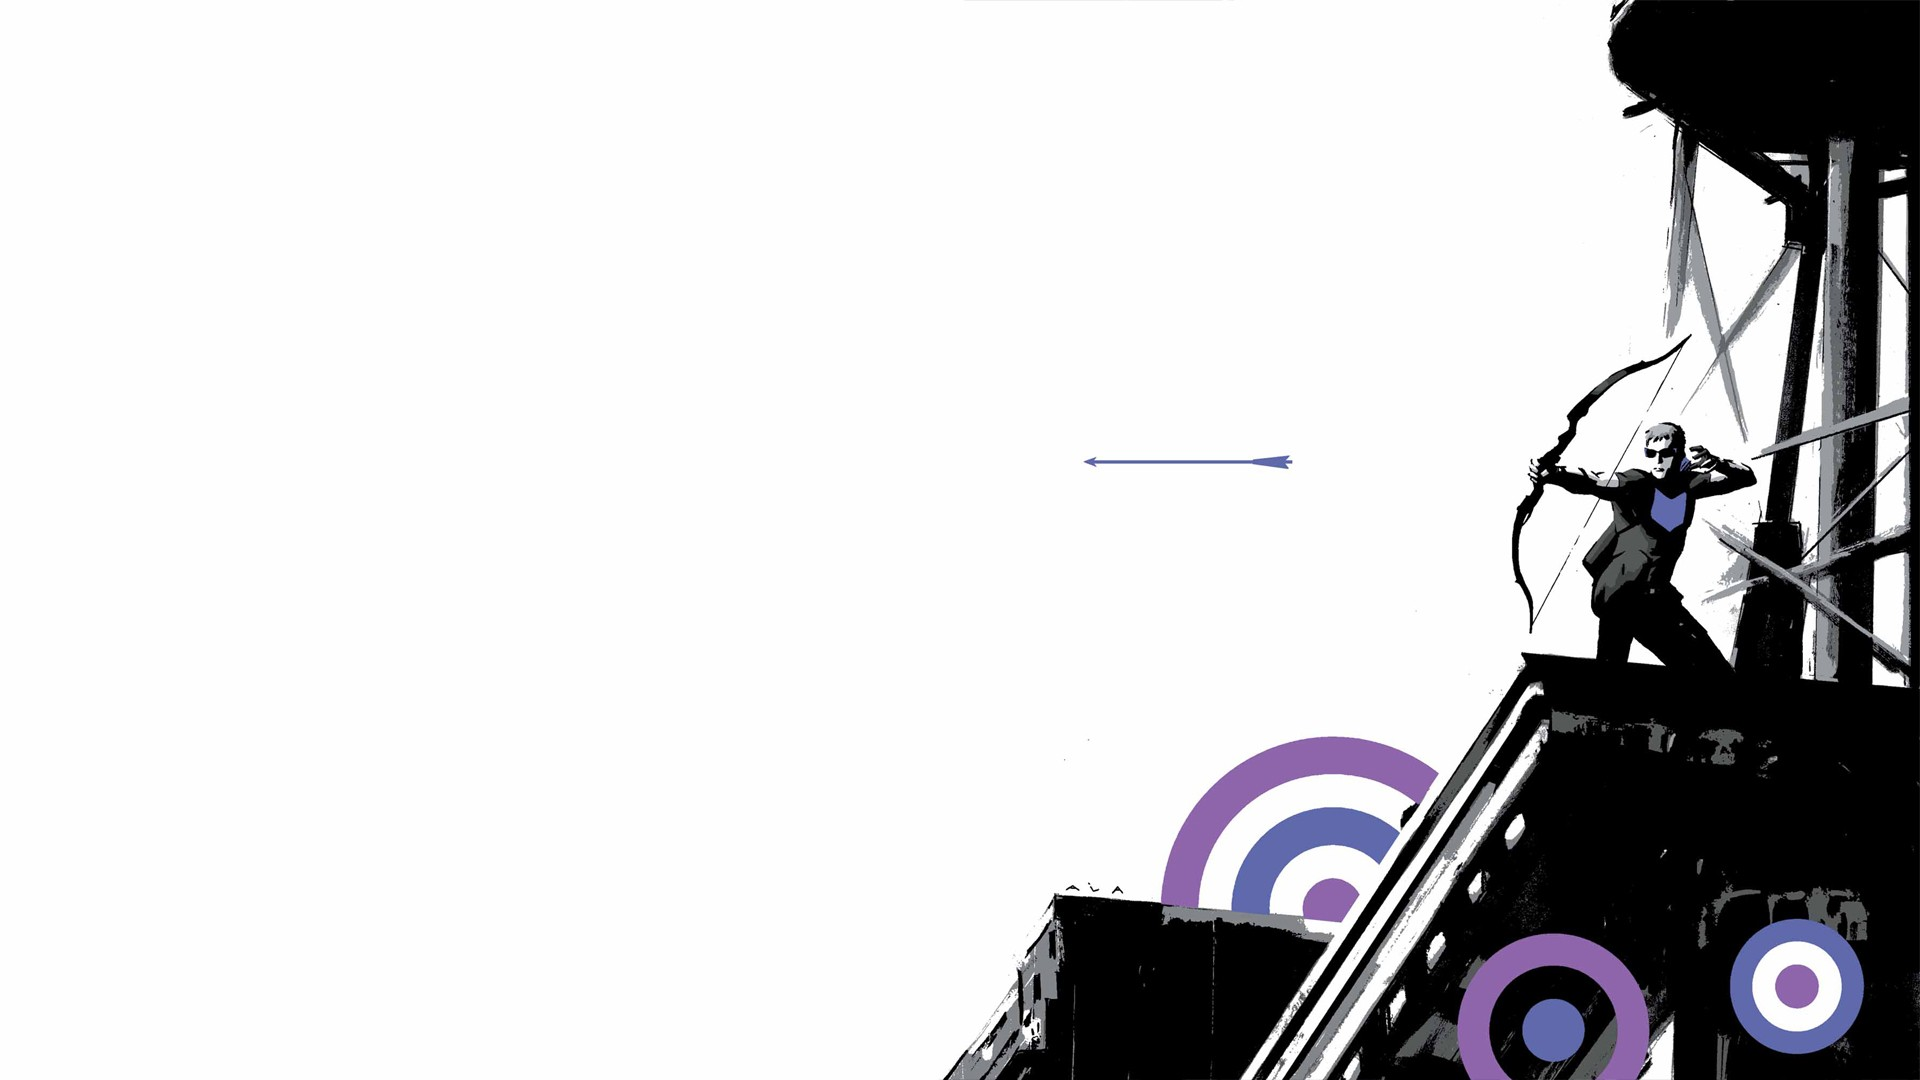 Hawk Iphone Wallpaper Hawkeye Full Hd Wallpaper And Background Image 1920x1080